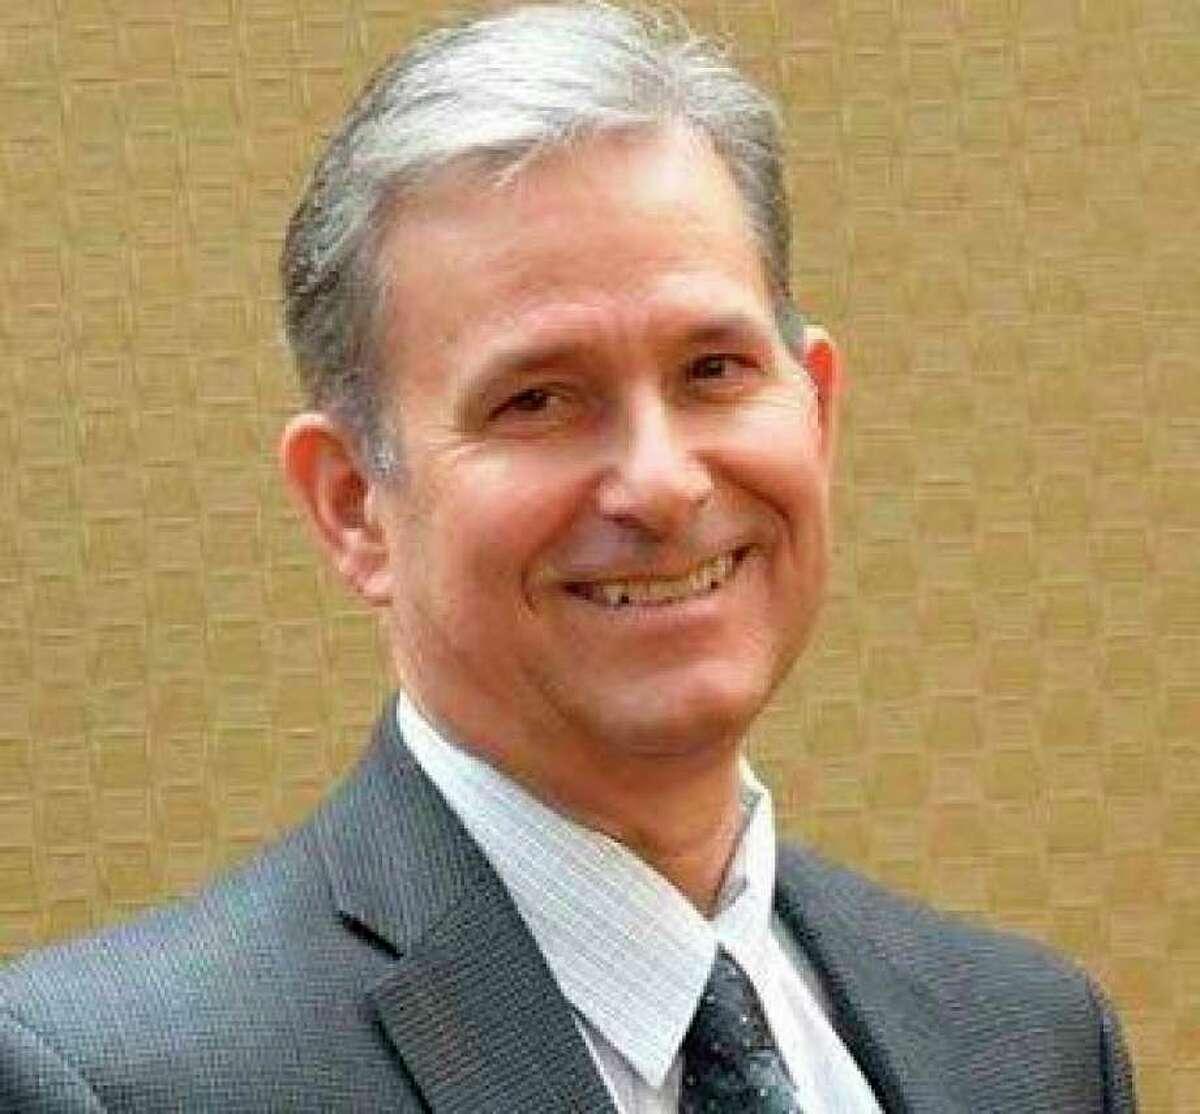 John A. Newby